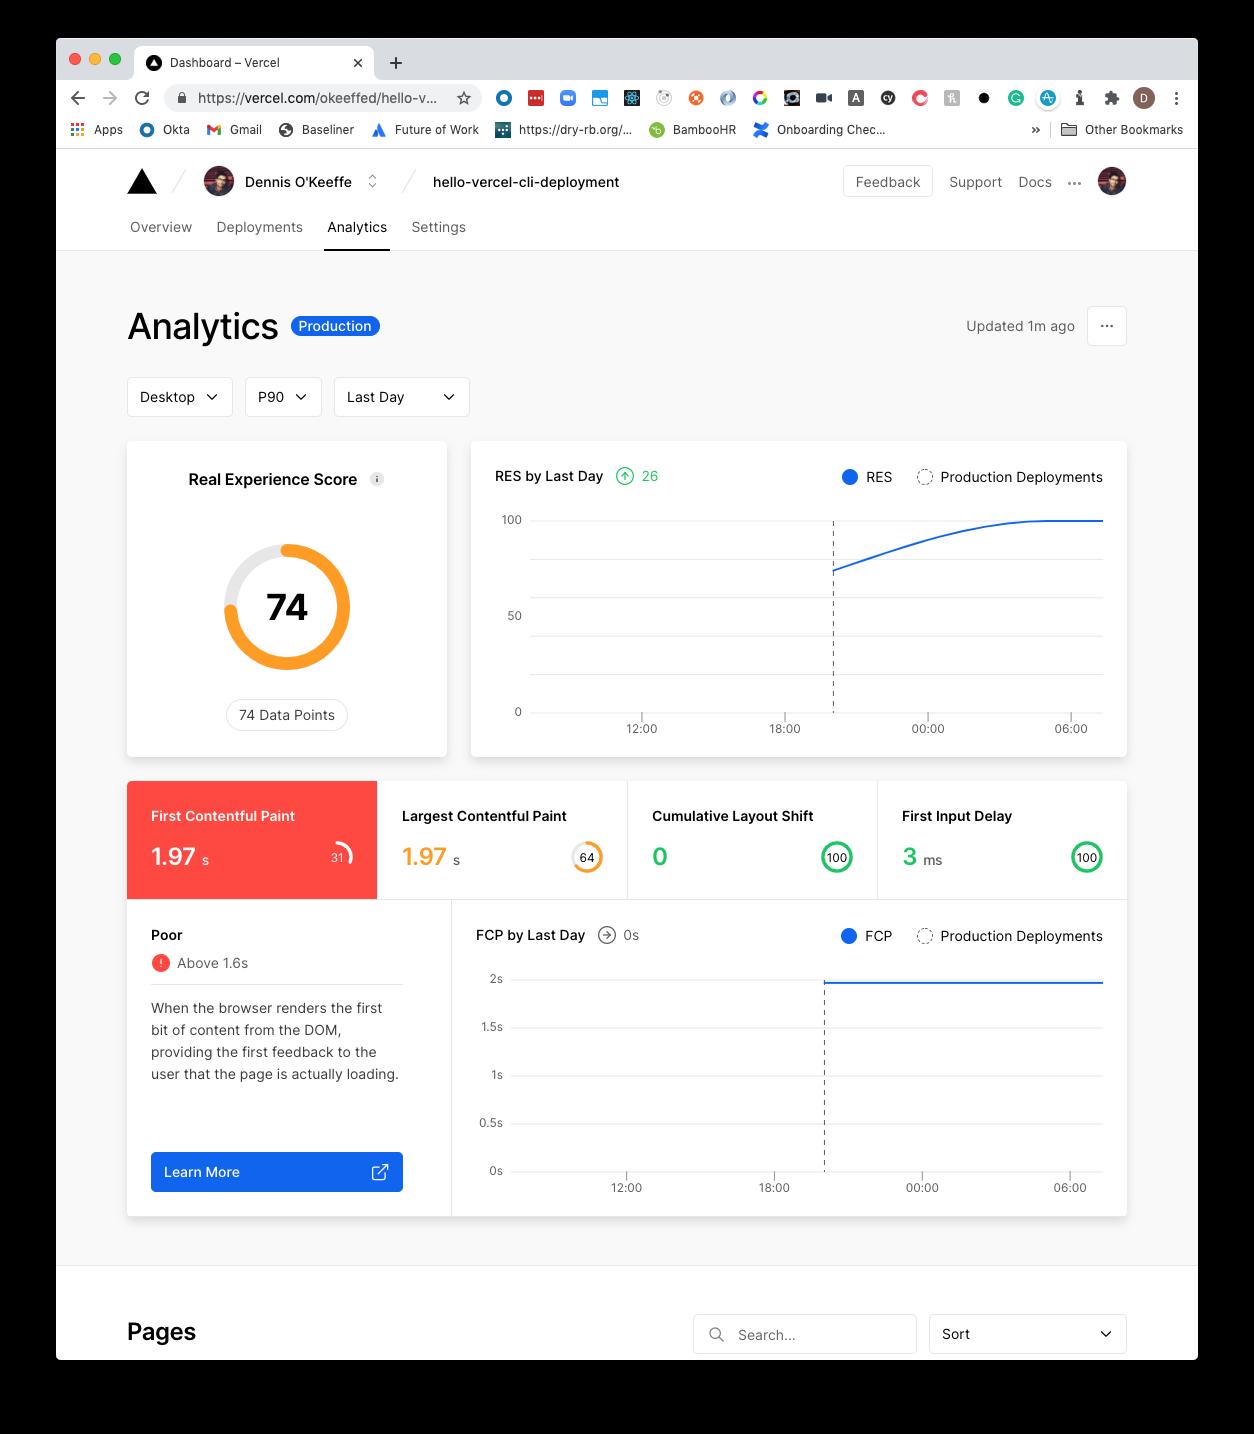 Vercel Analytics 90th percentile